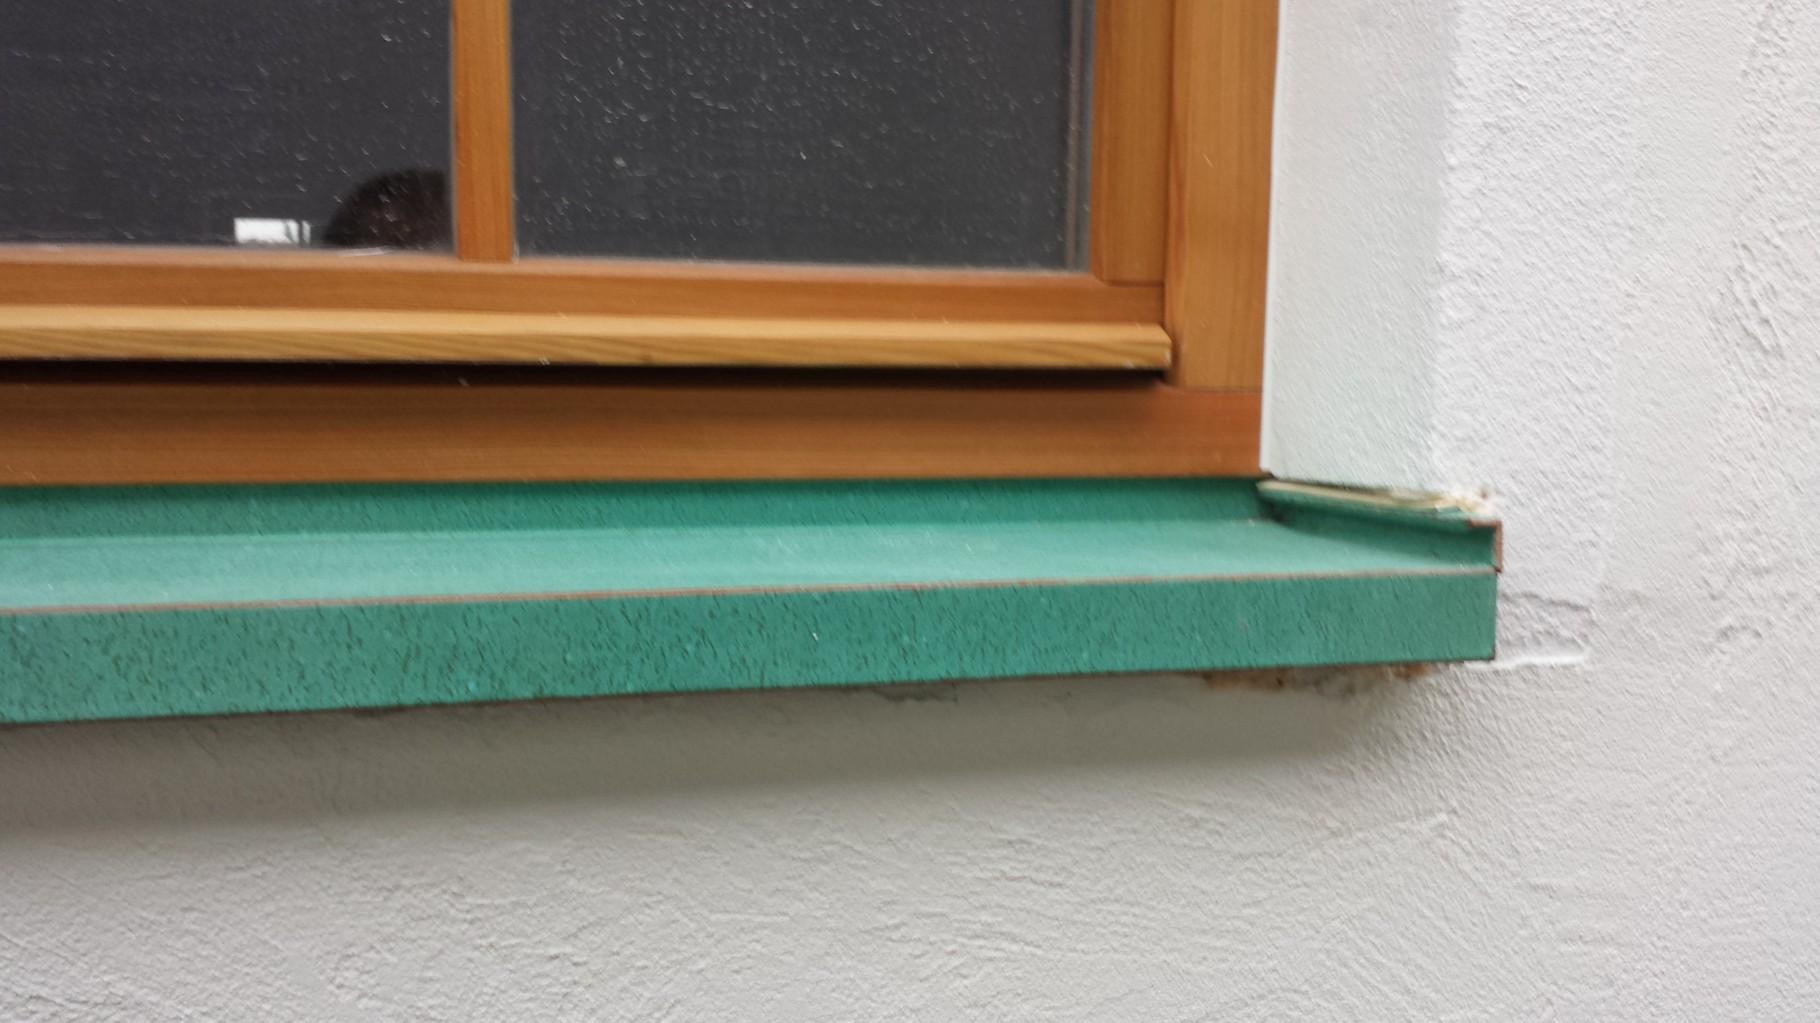 Patinierte Fensterbänke